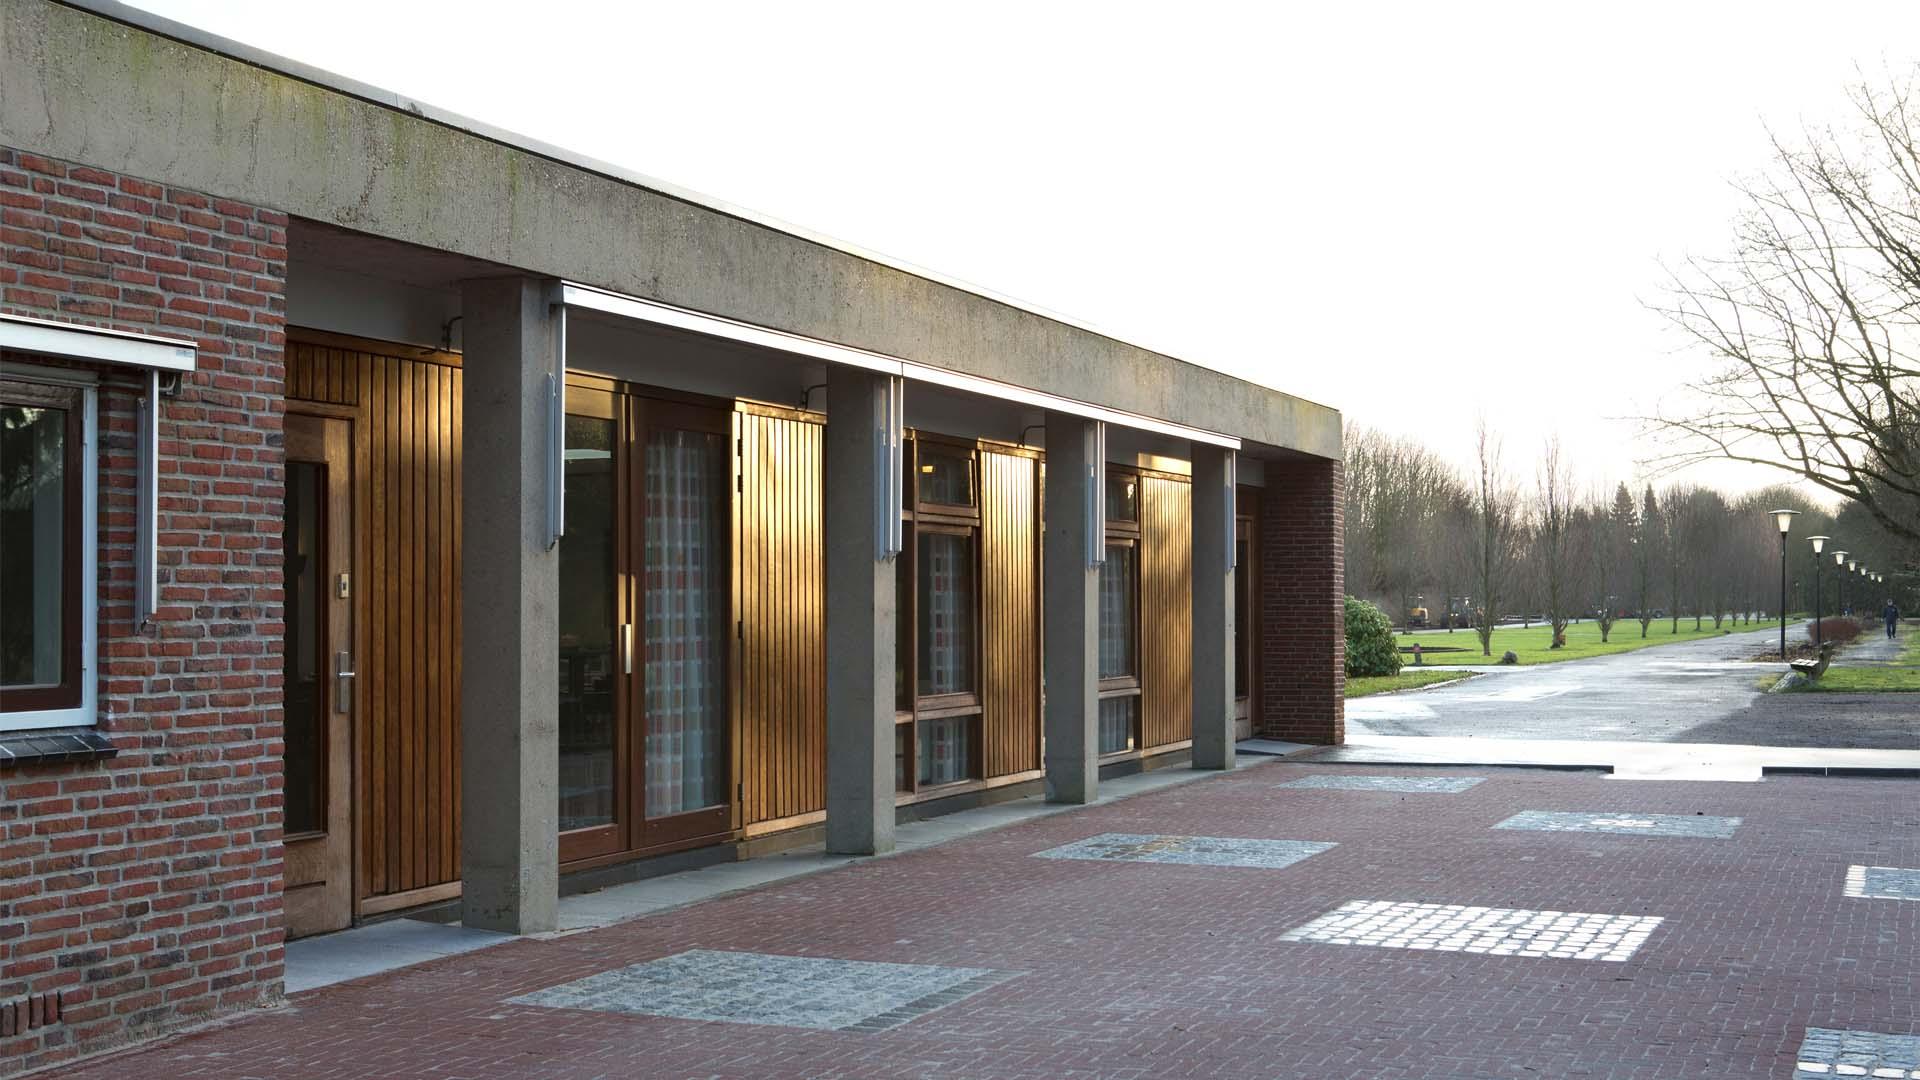 1337_Aula Selwerderhof Groningen_03